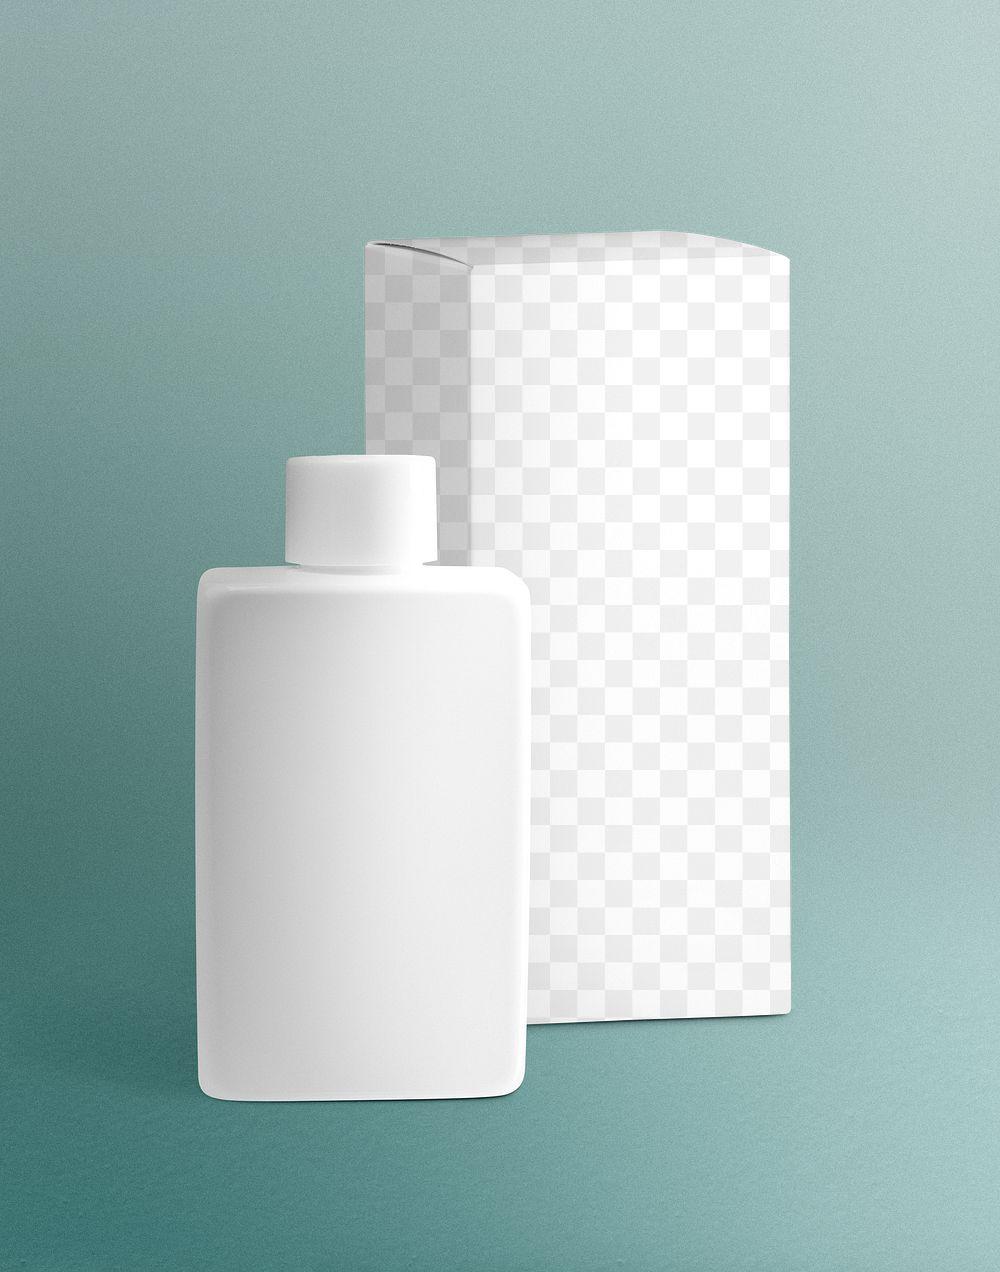 Png hand wash bottle mockup product packaging